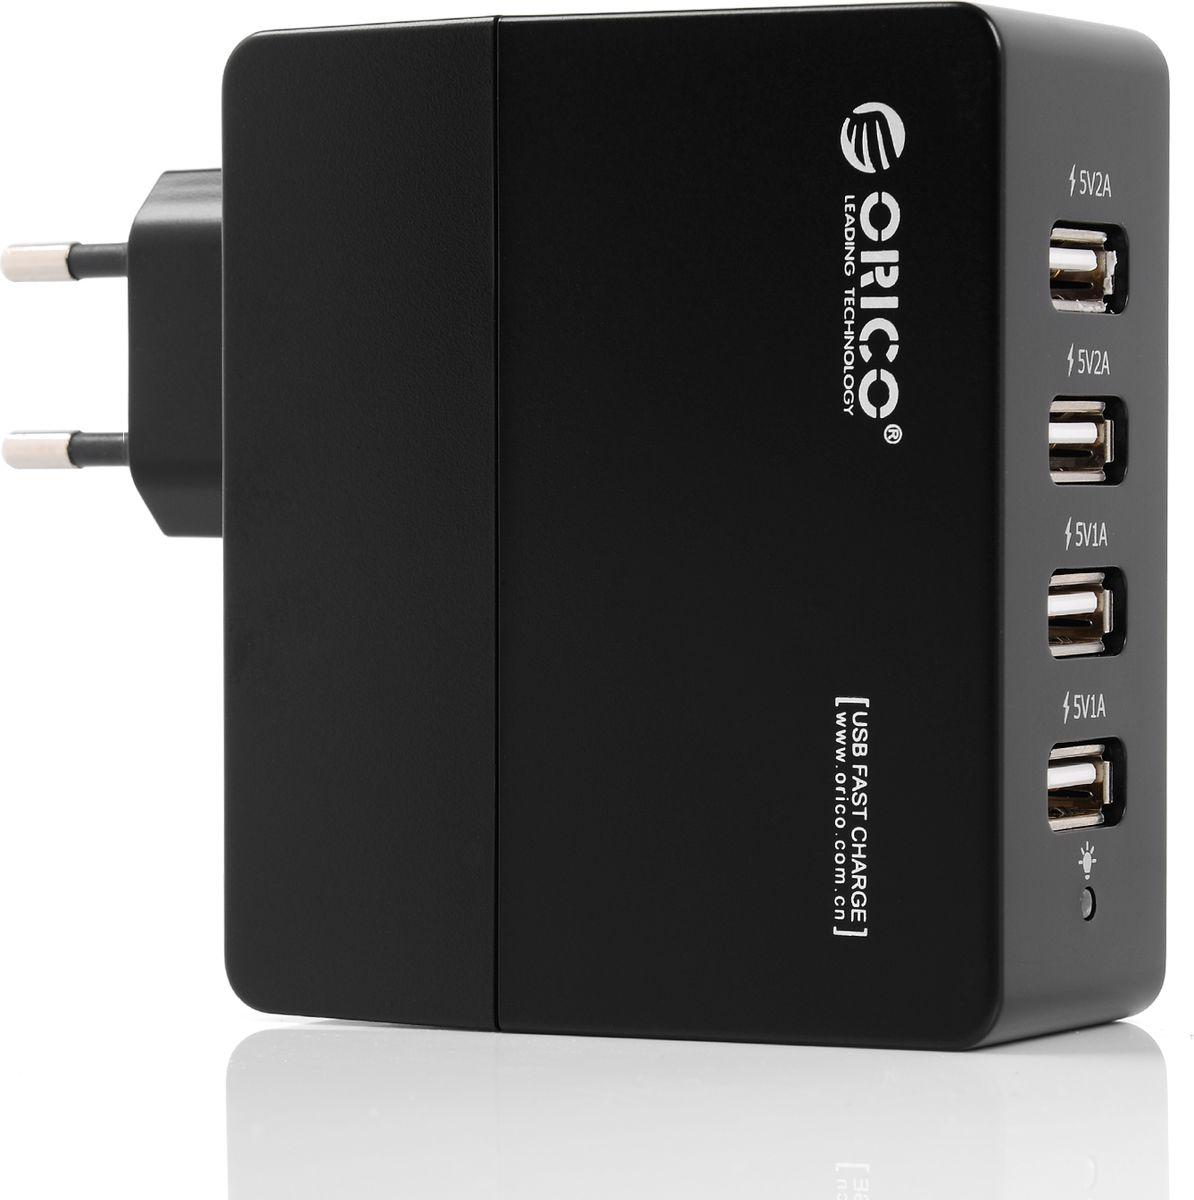 Orico DCA-4U, Black сетевое зарядное устройство цена